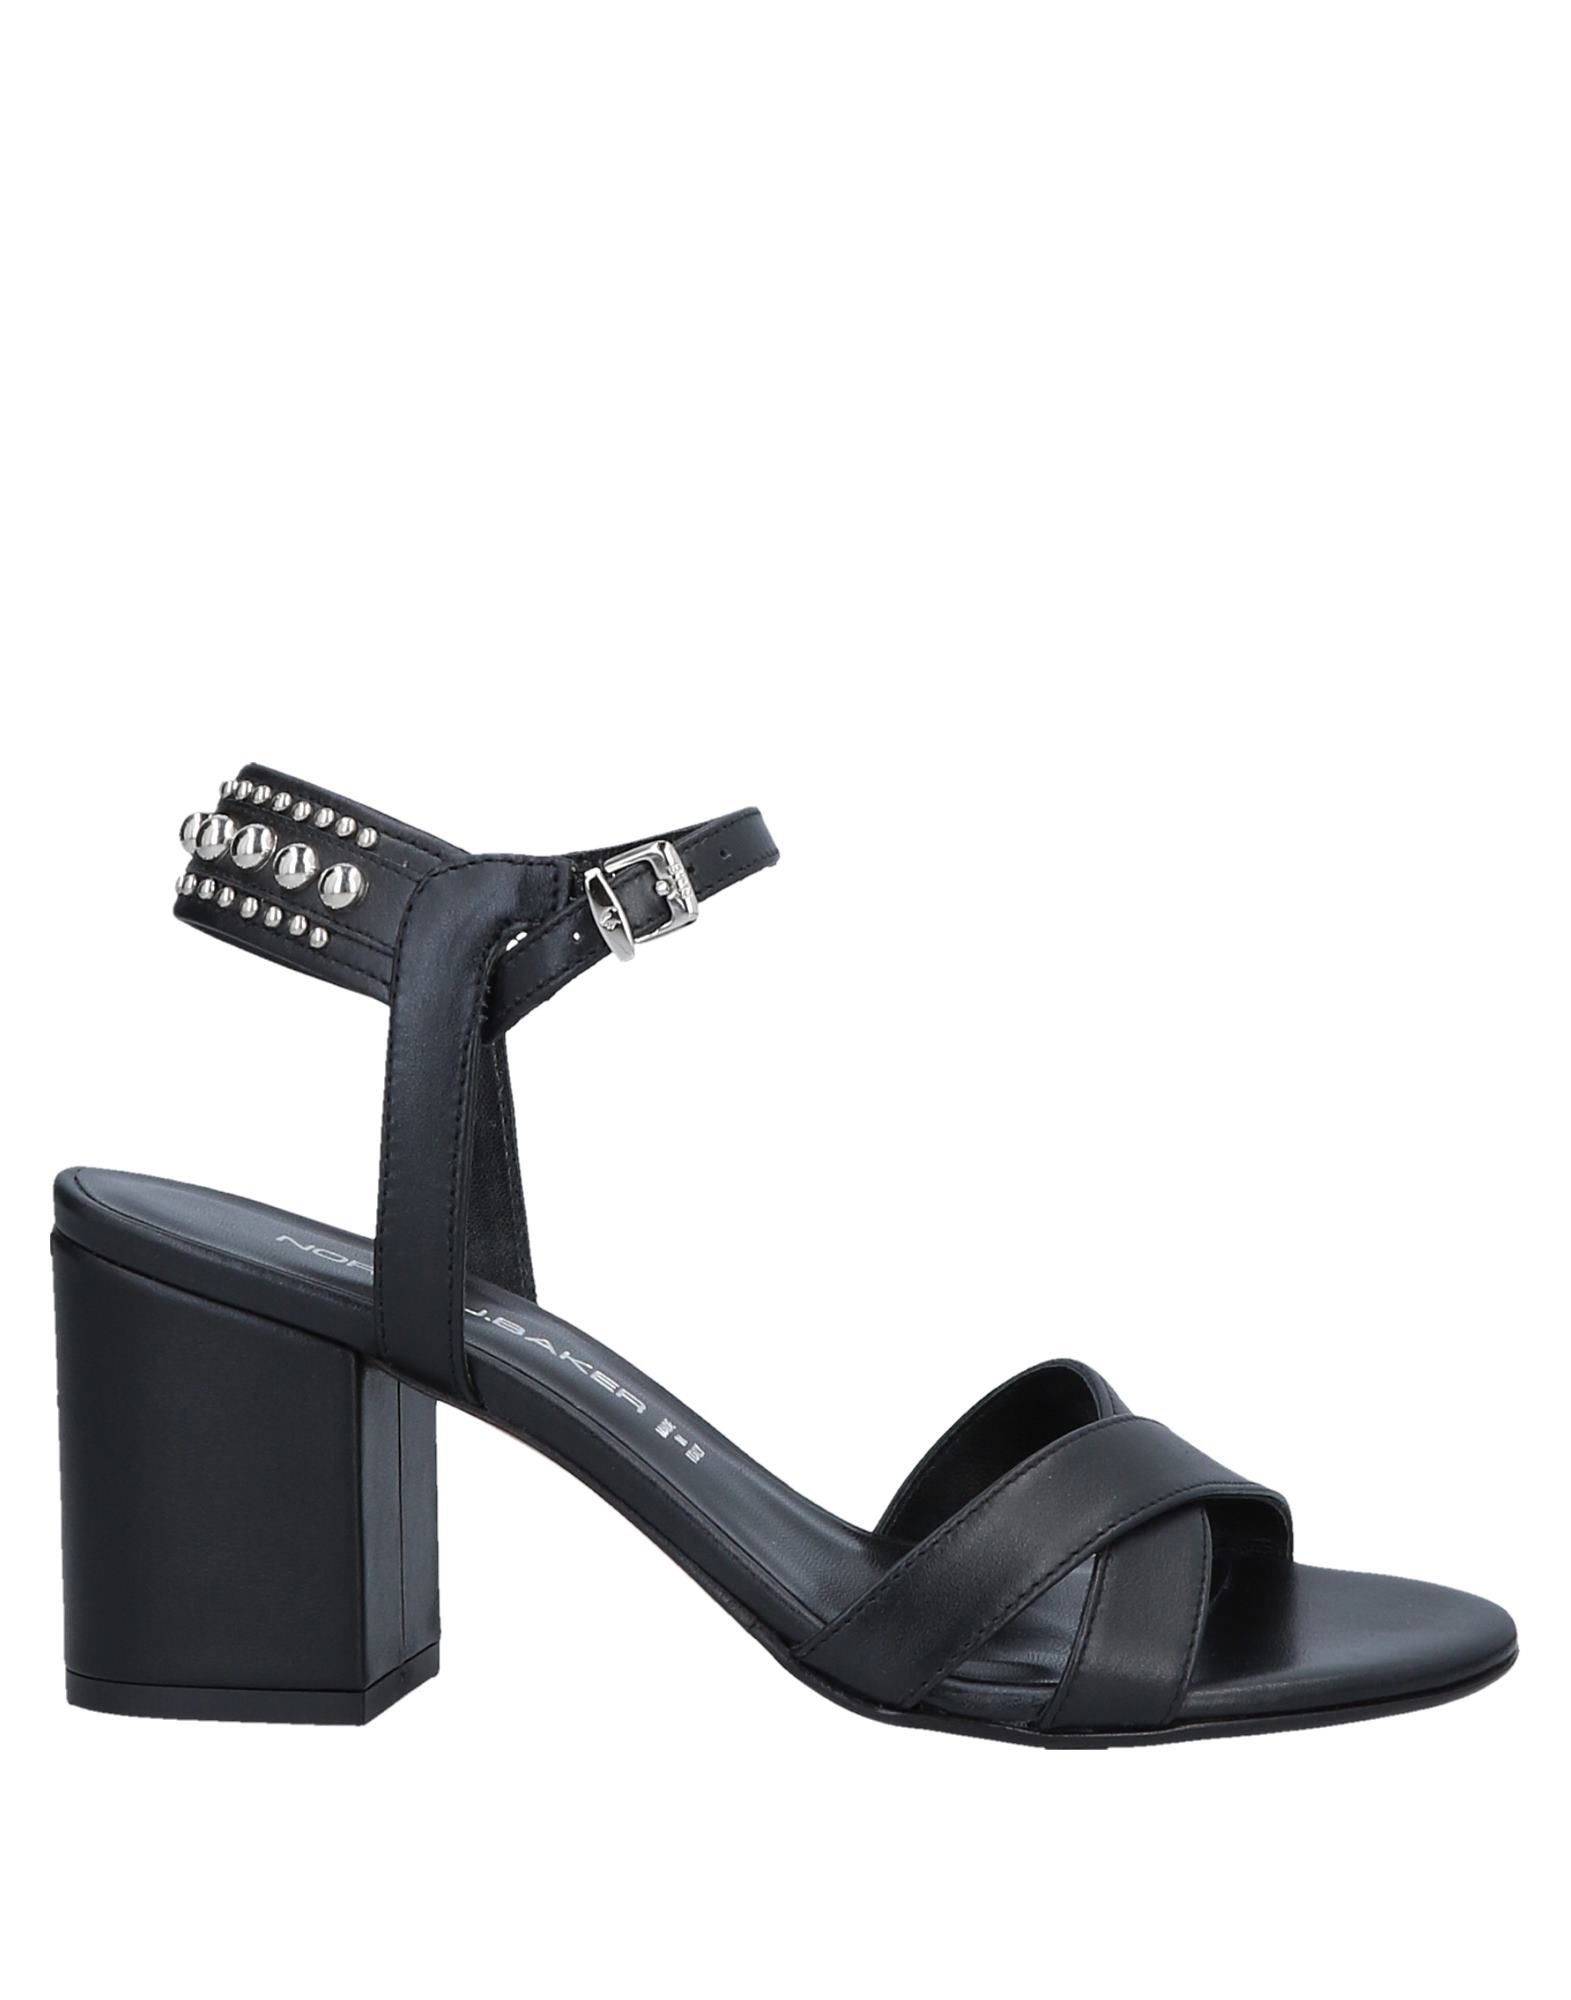 мужские сандали интернет магазин